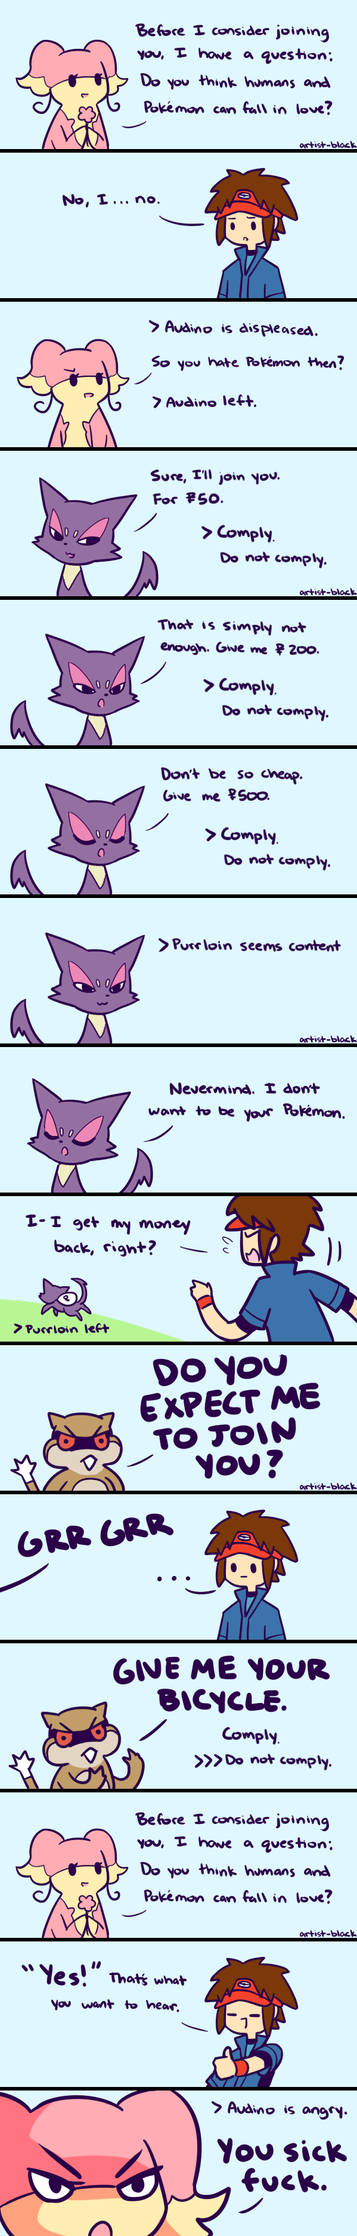 Pokemon Negotiations